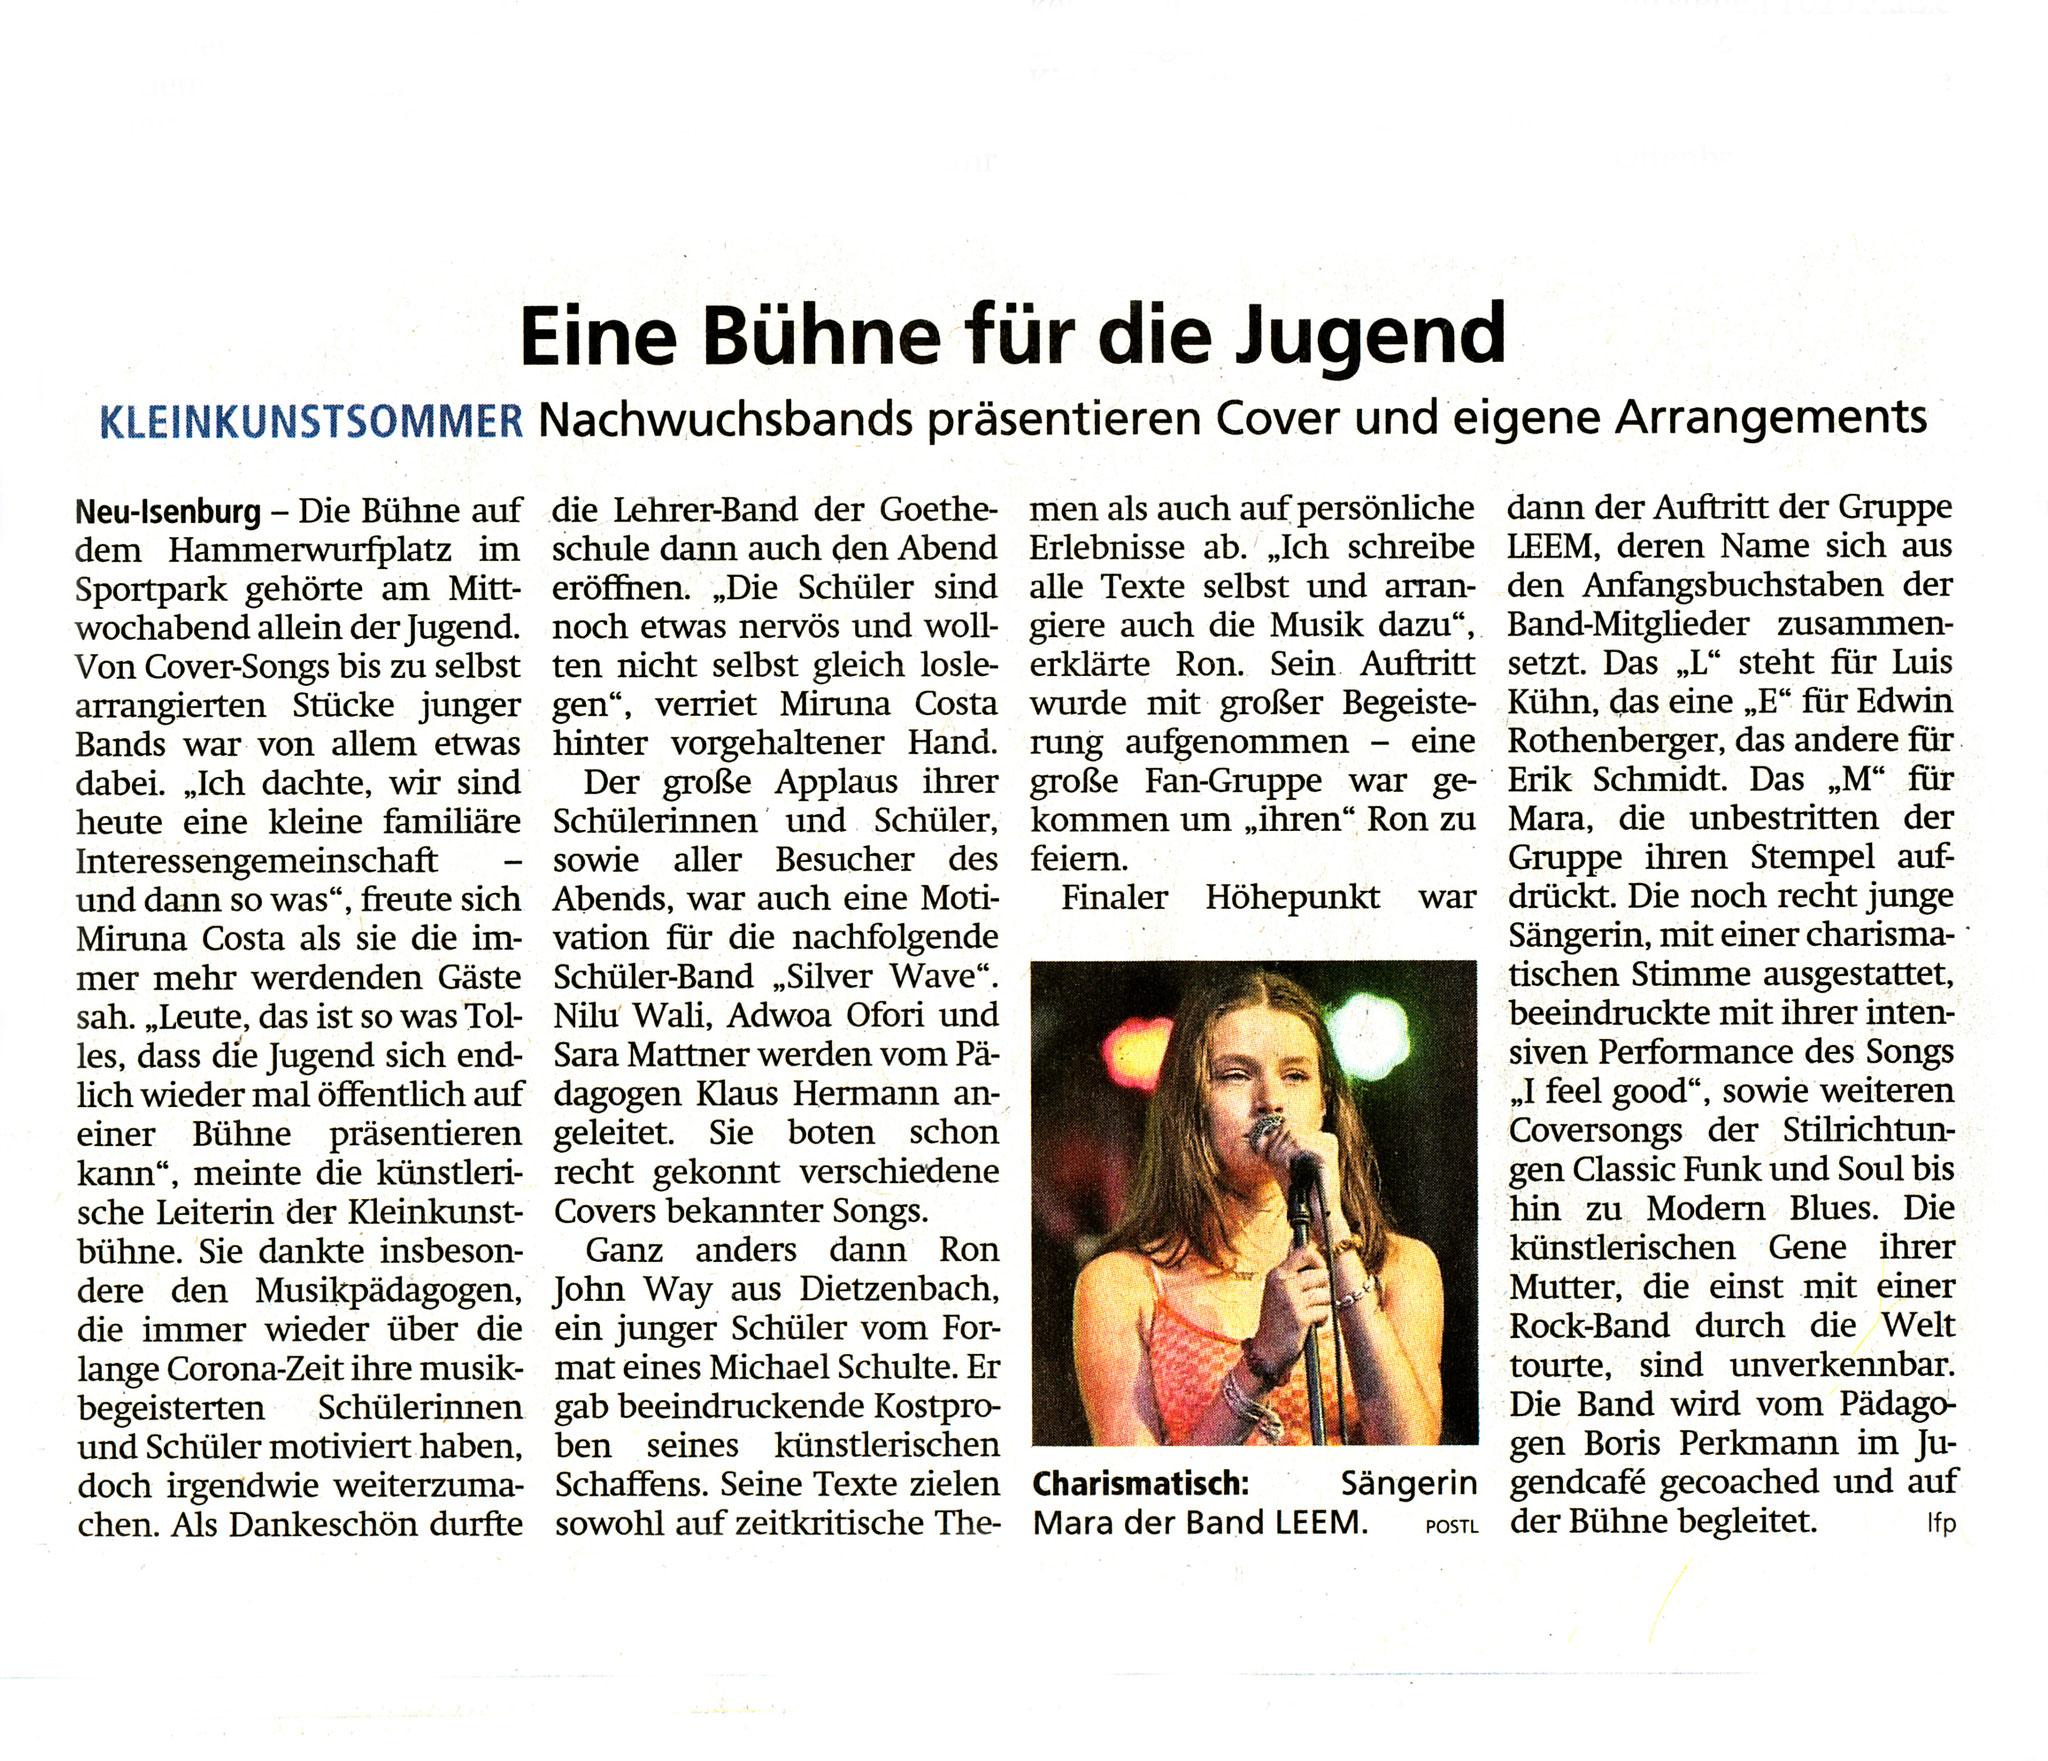 Offenbach Post, 24. September 2021